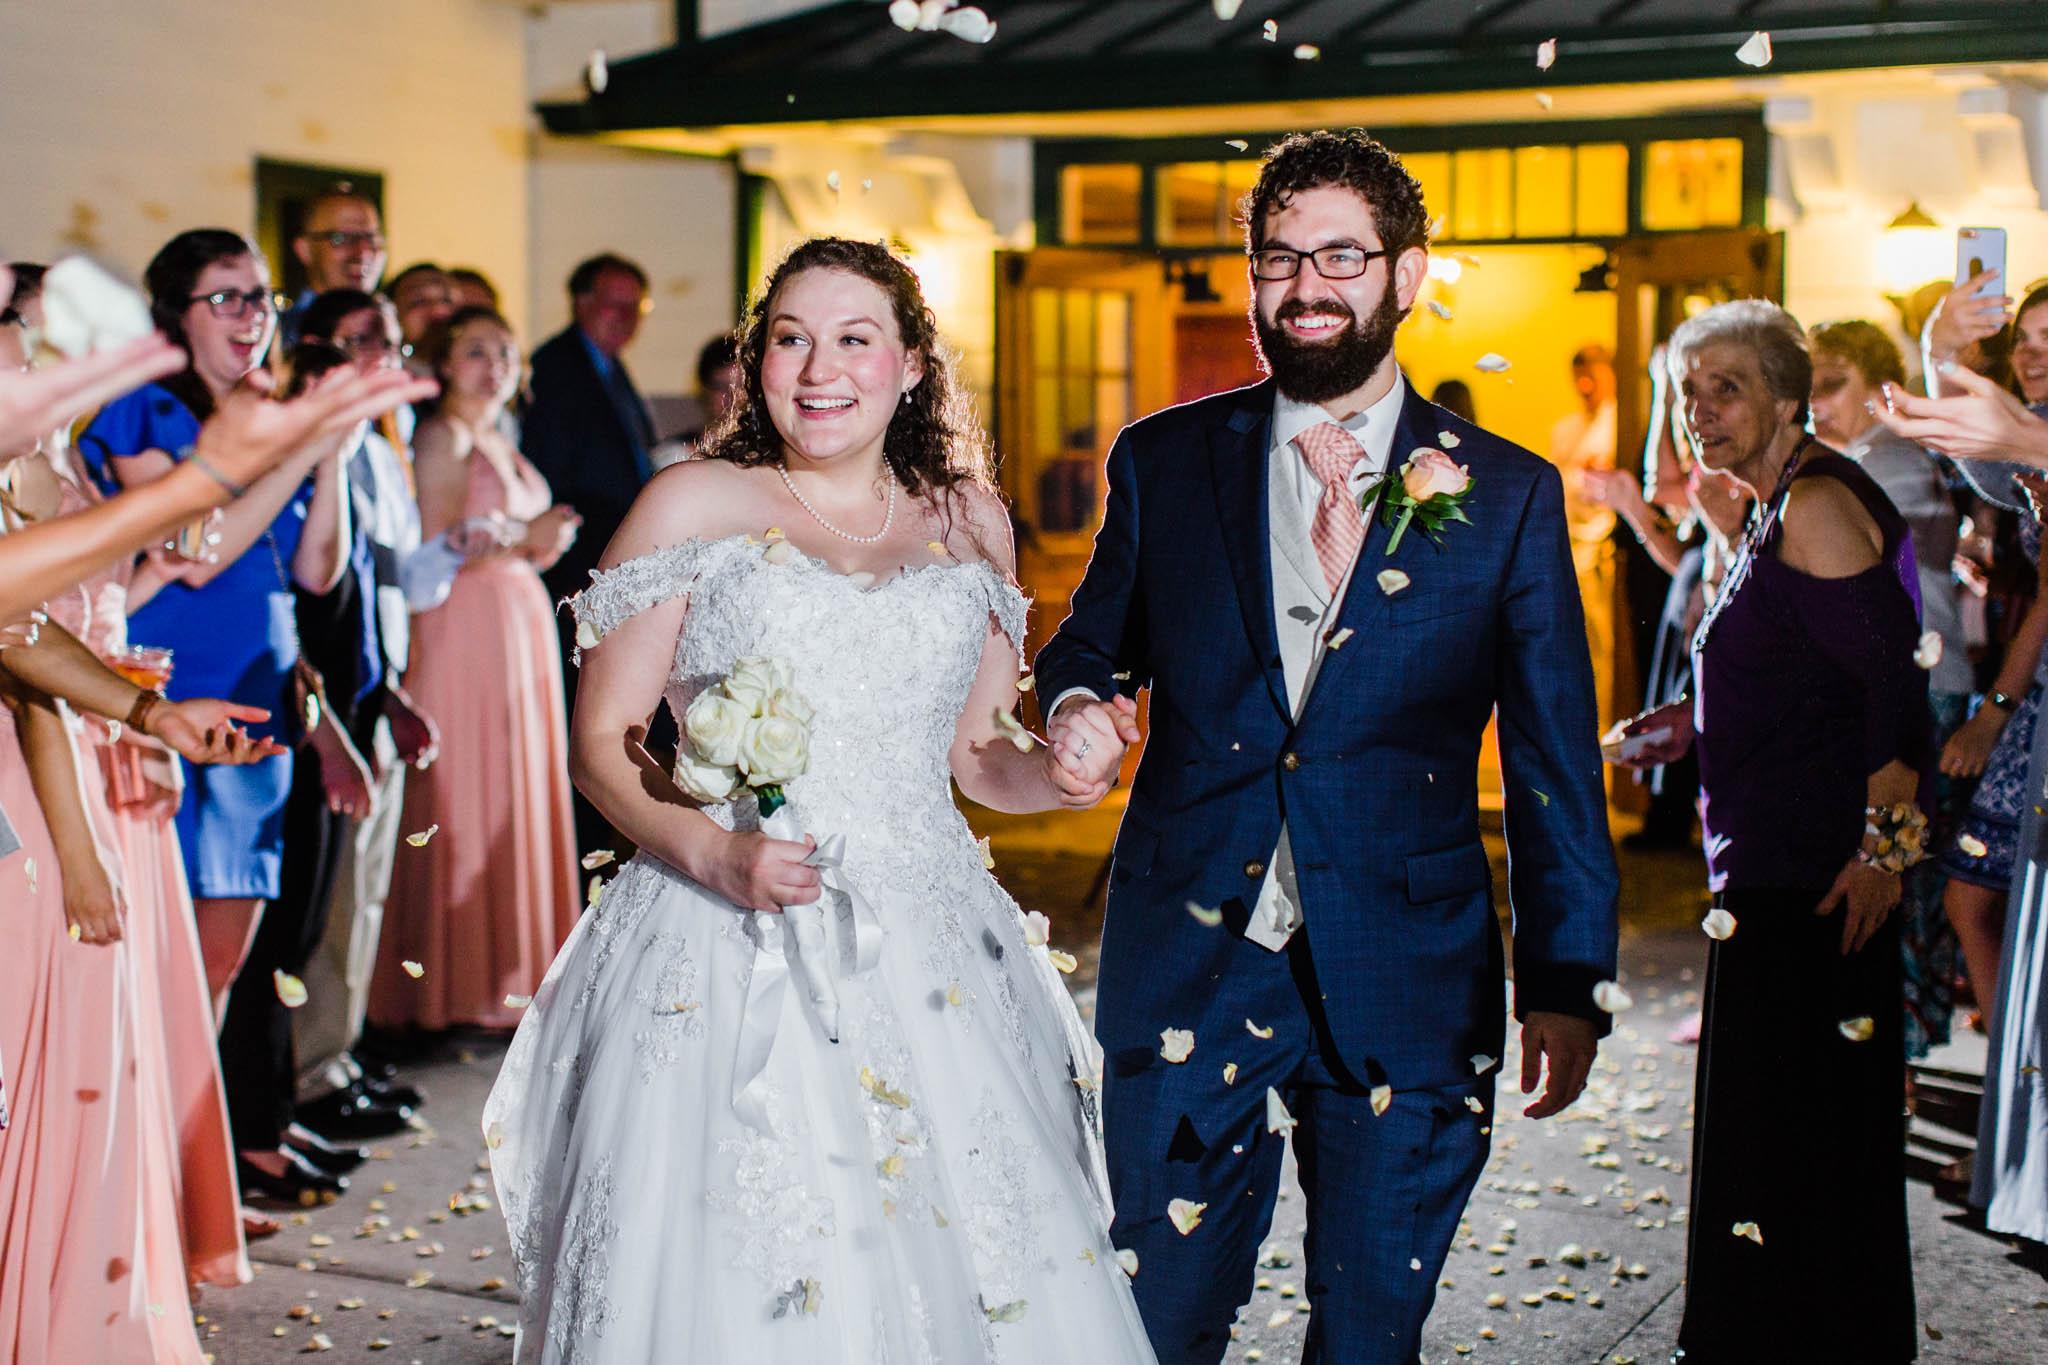 lynchburg-virginia-wedding-photographer-197.jpg